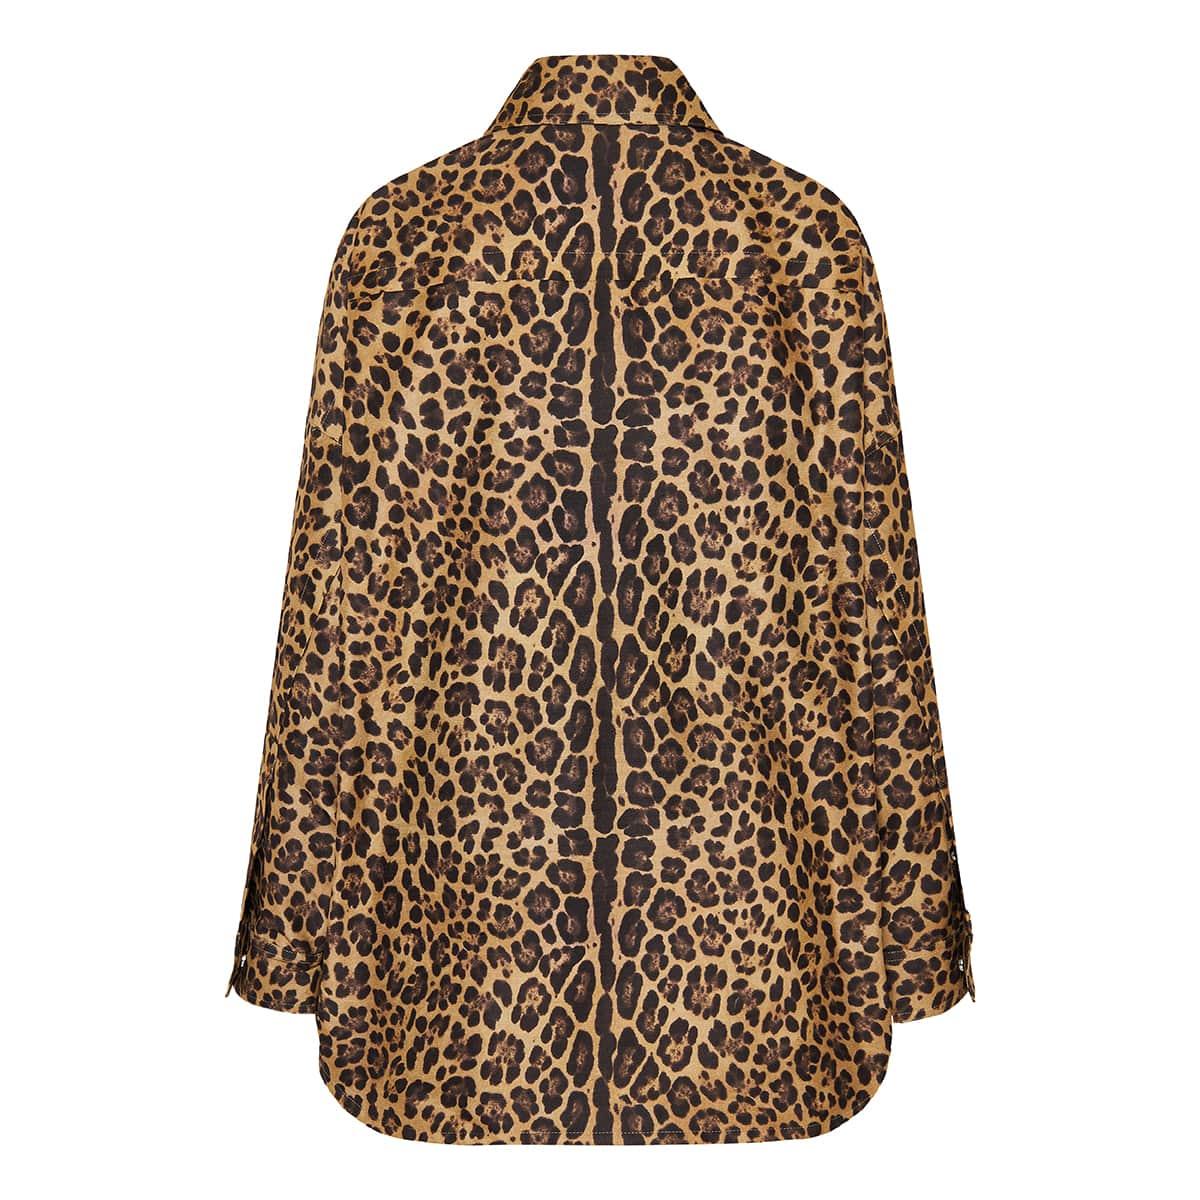 Leopard oversized cotton pea coat